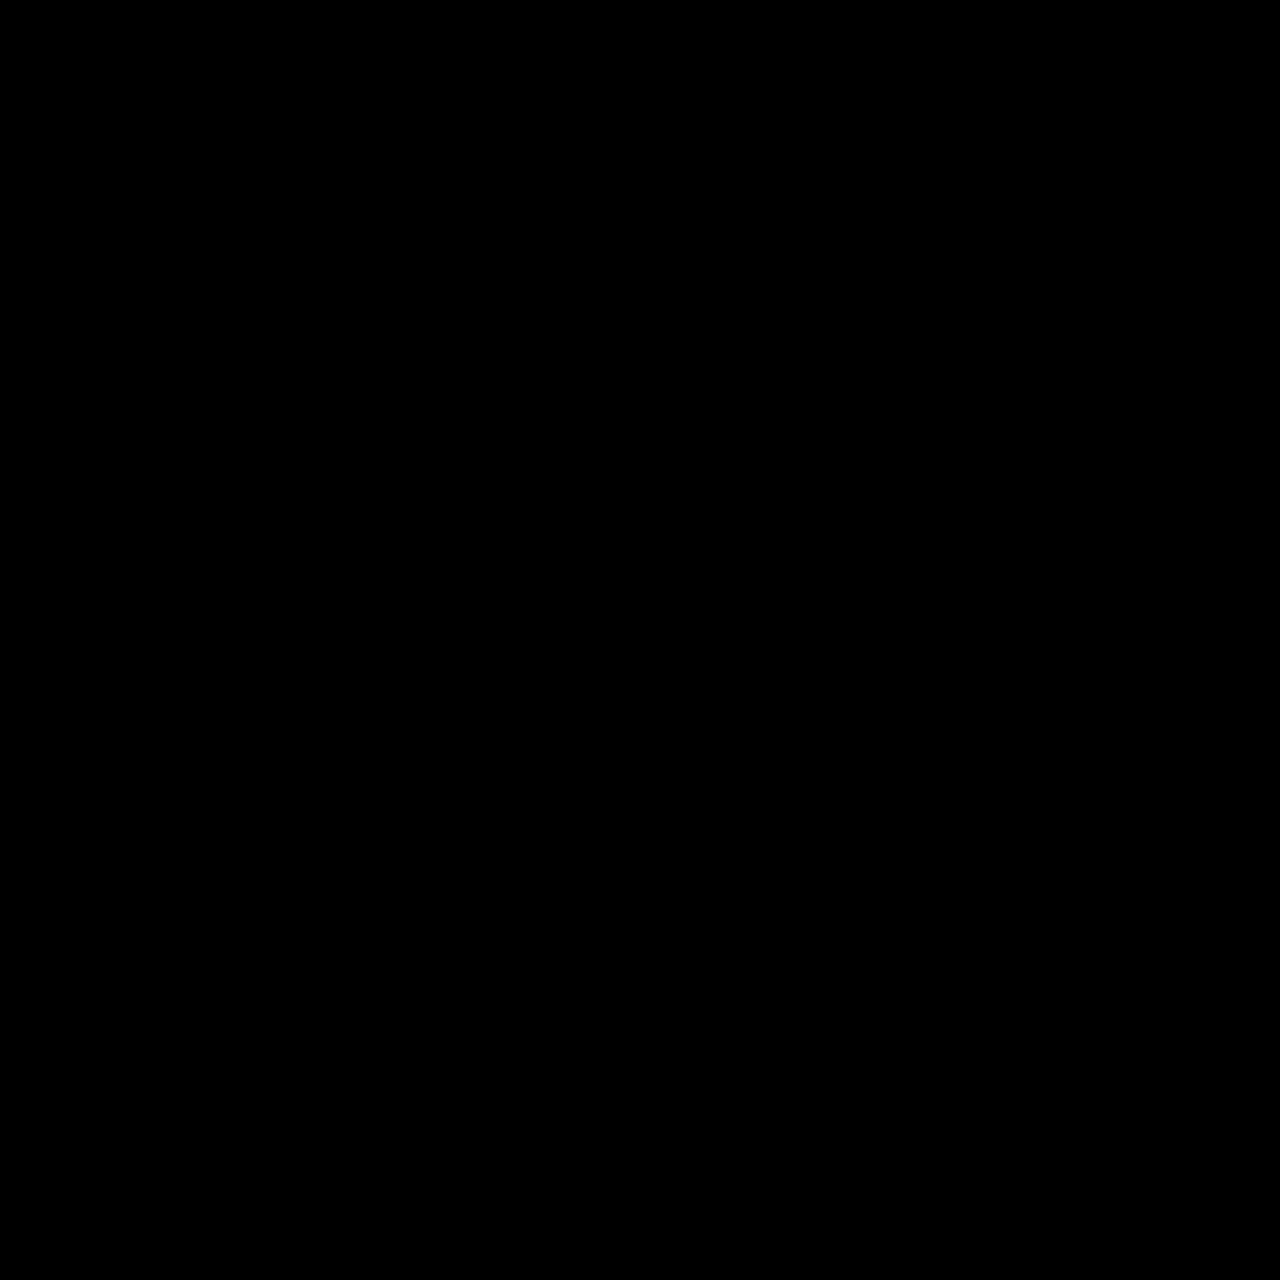 KIT 30 Maxiar – Vidro Alvenaria